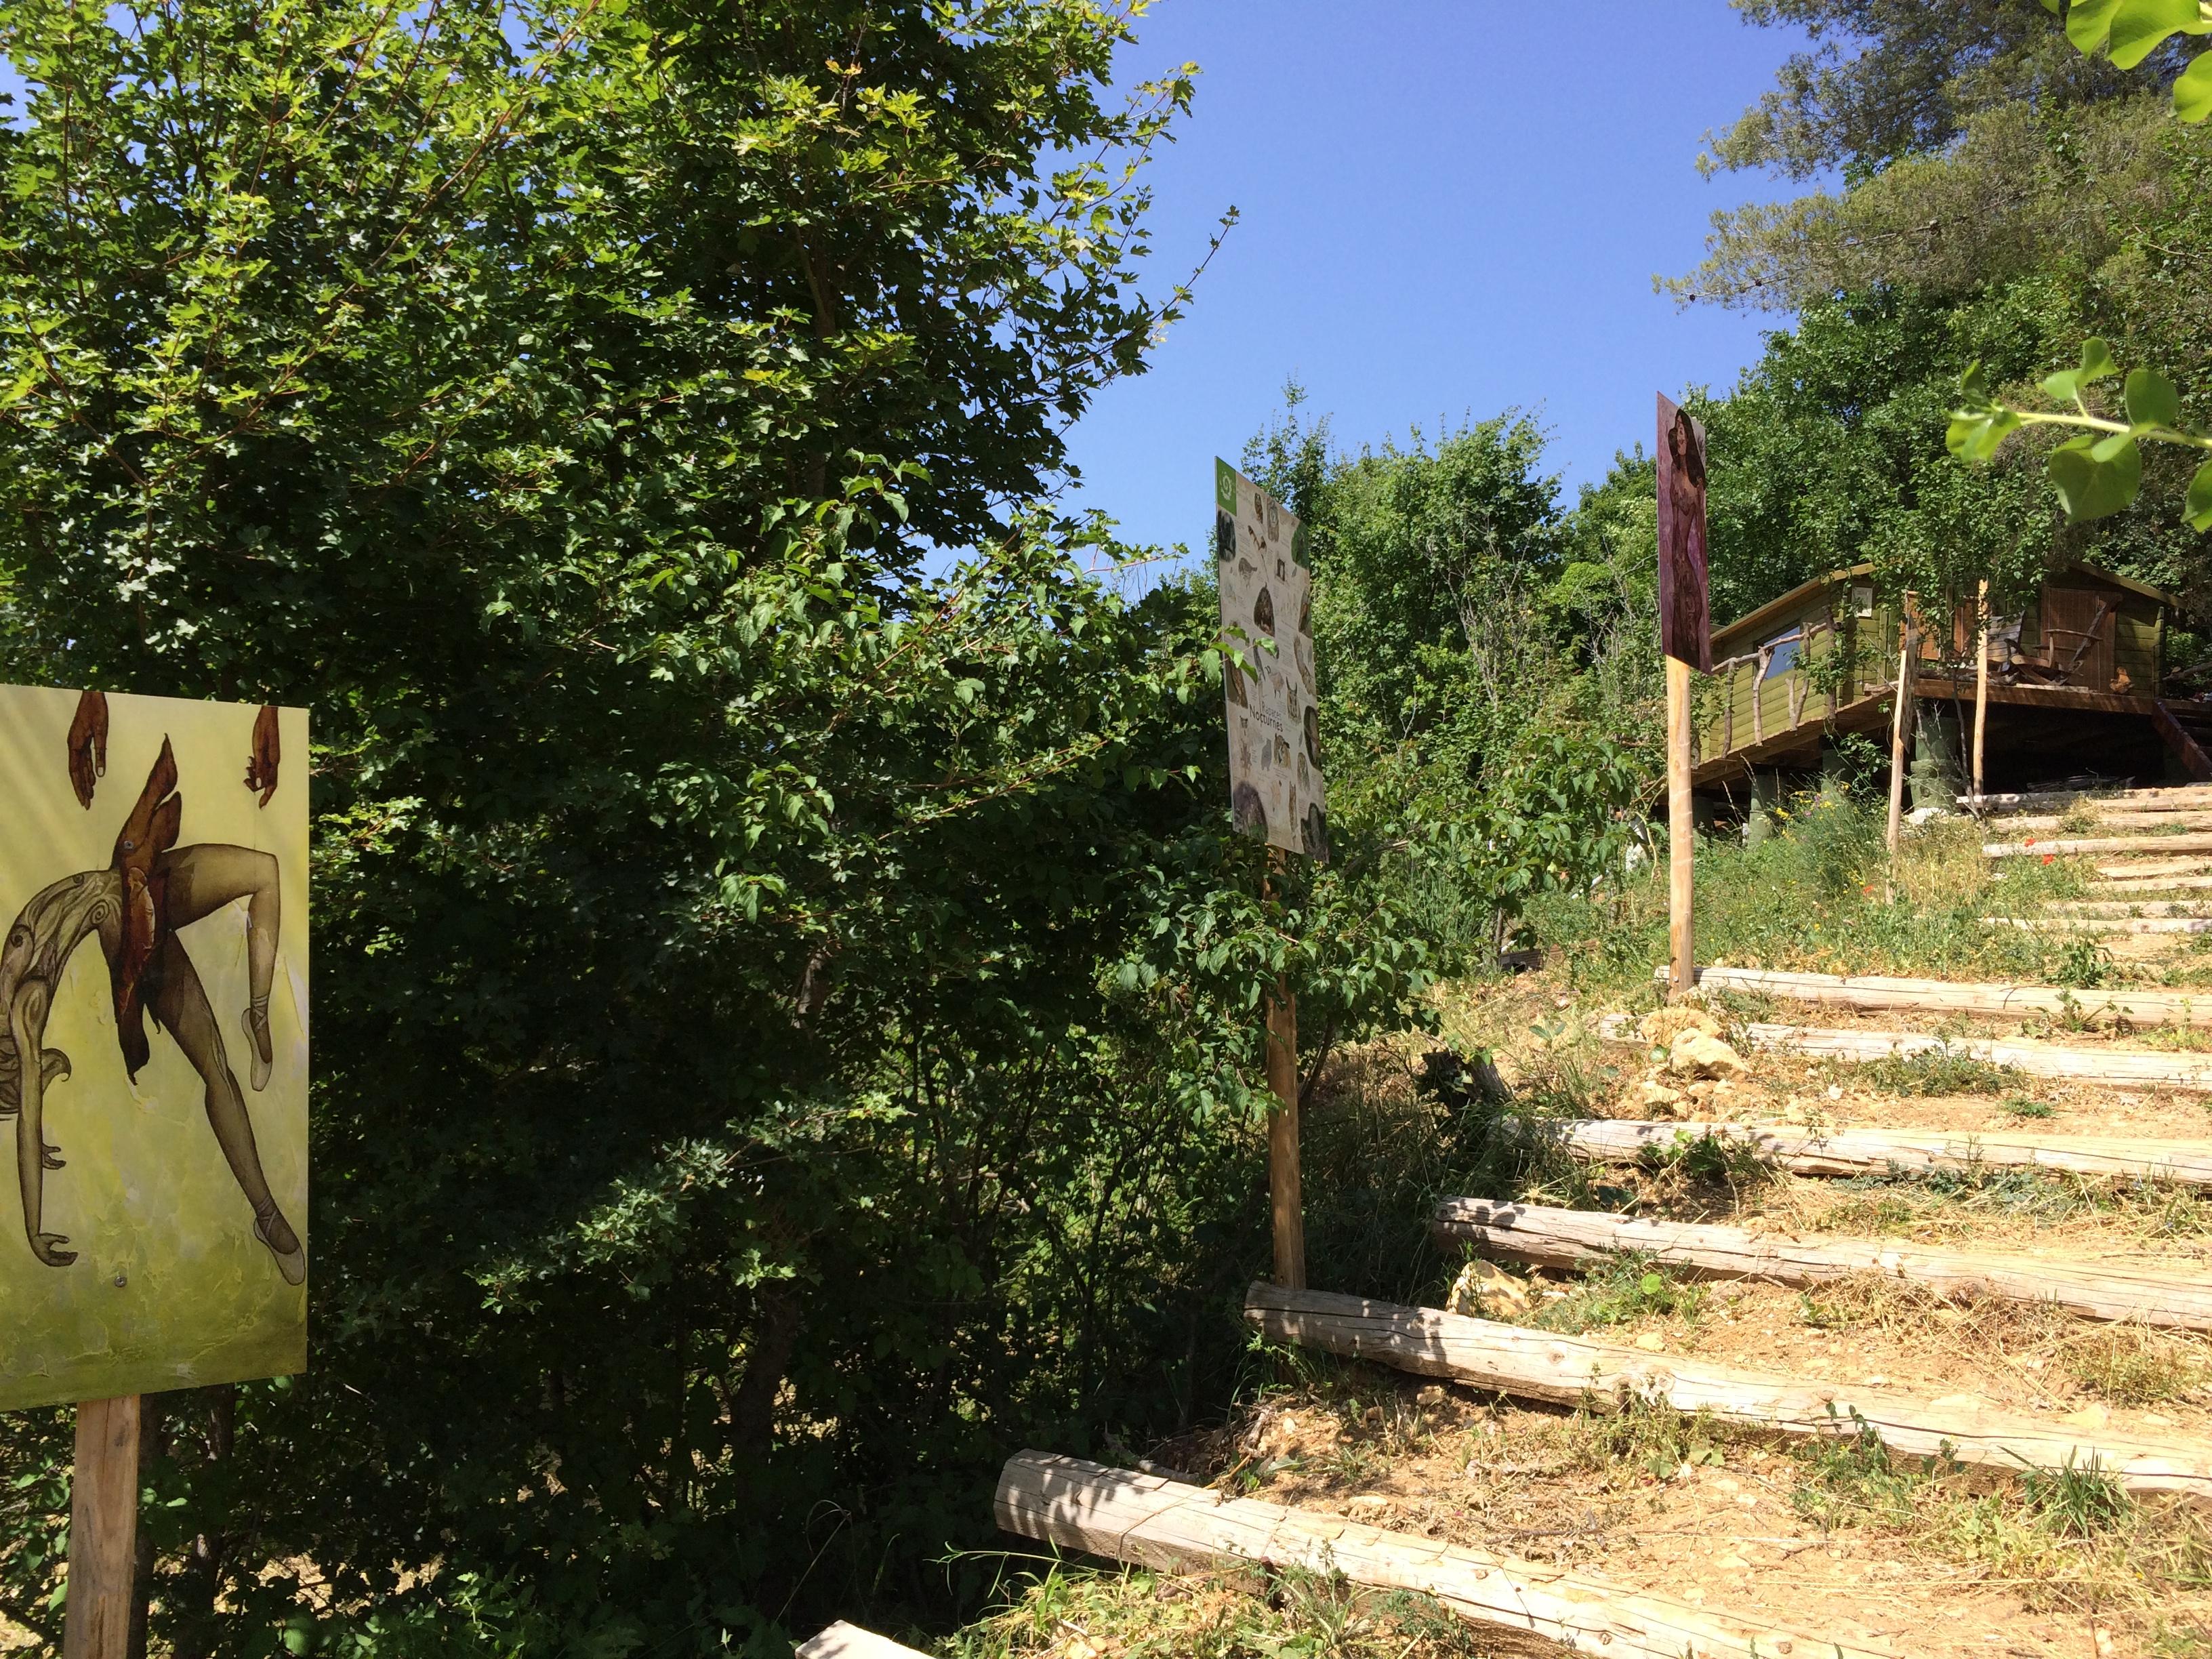 Le chemin qui mène à la cabane